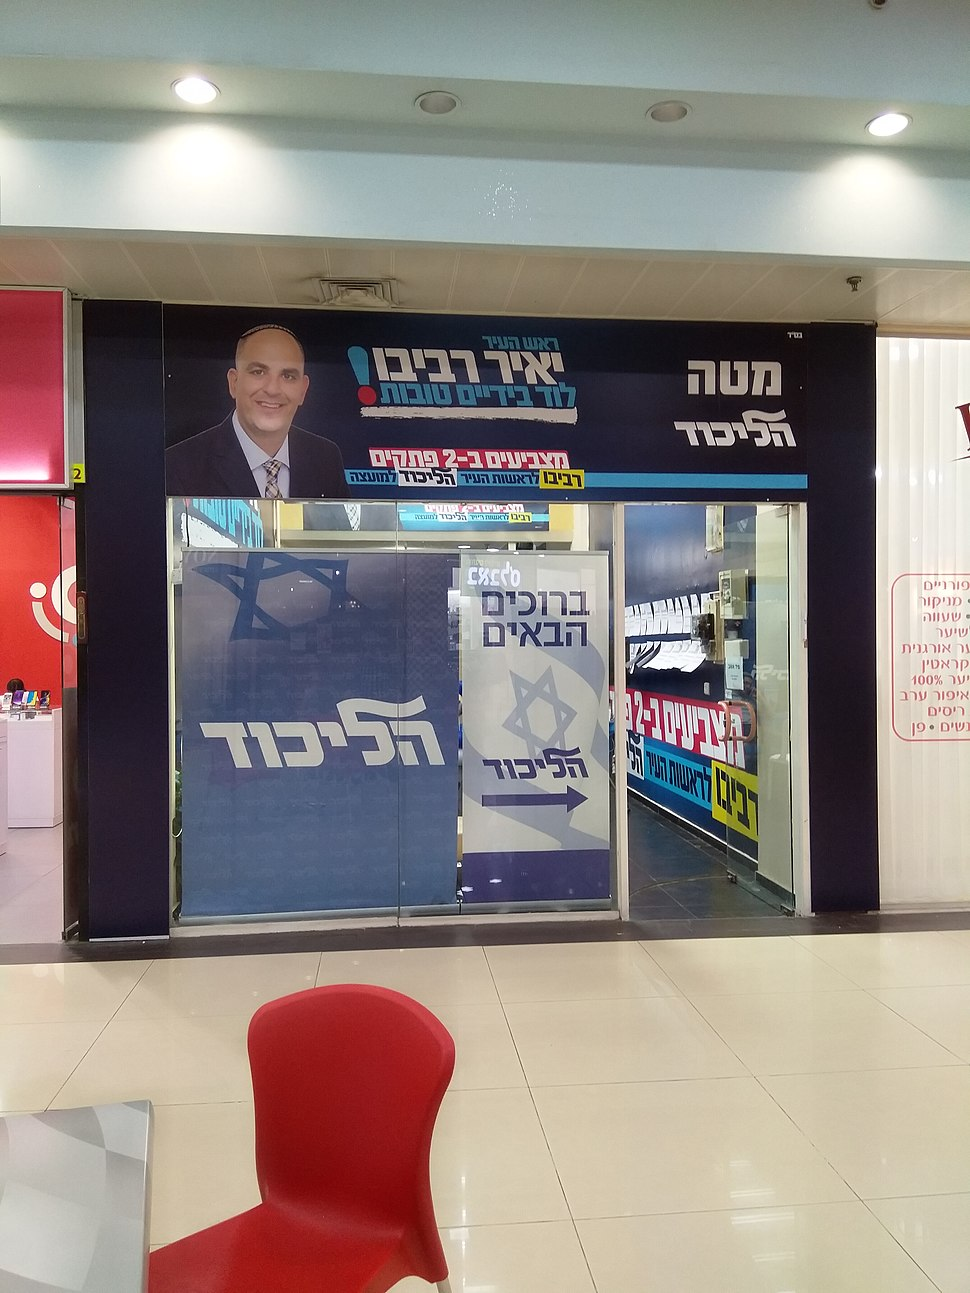 Likud HQ in 2018 Lod elections